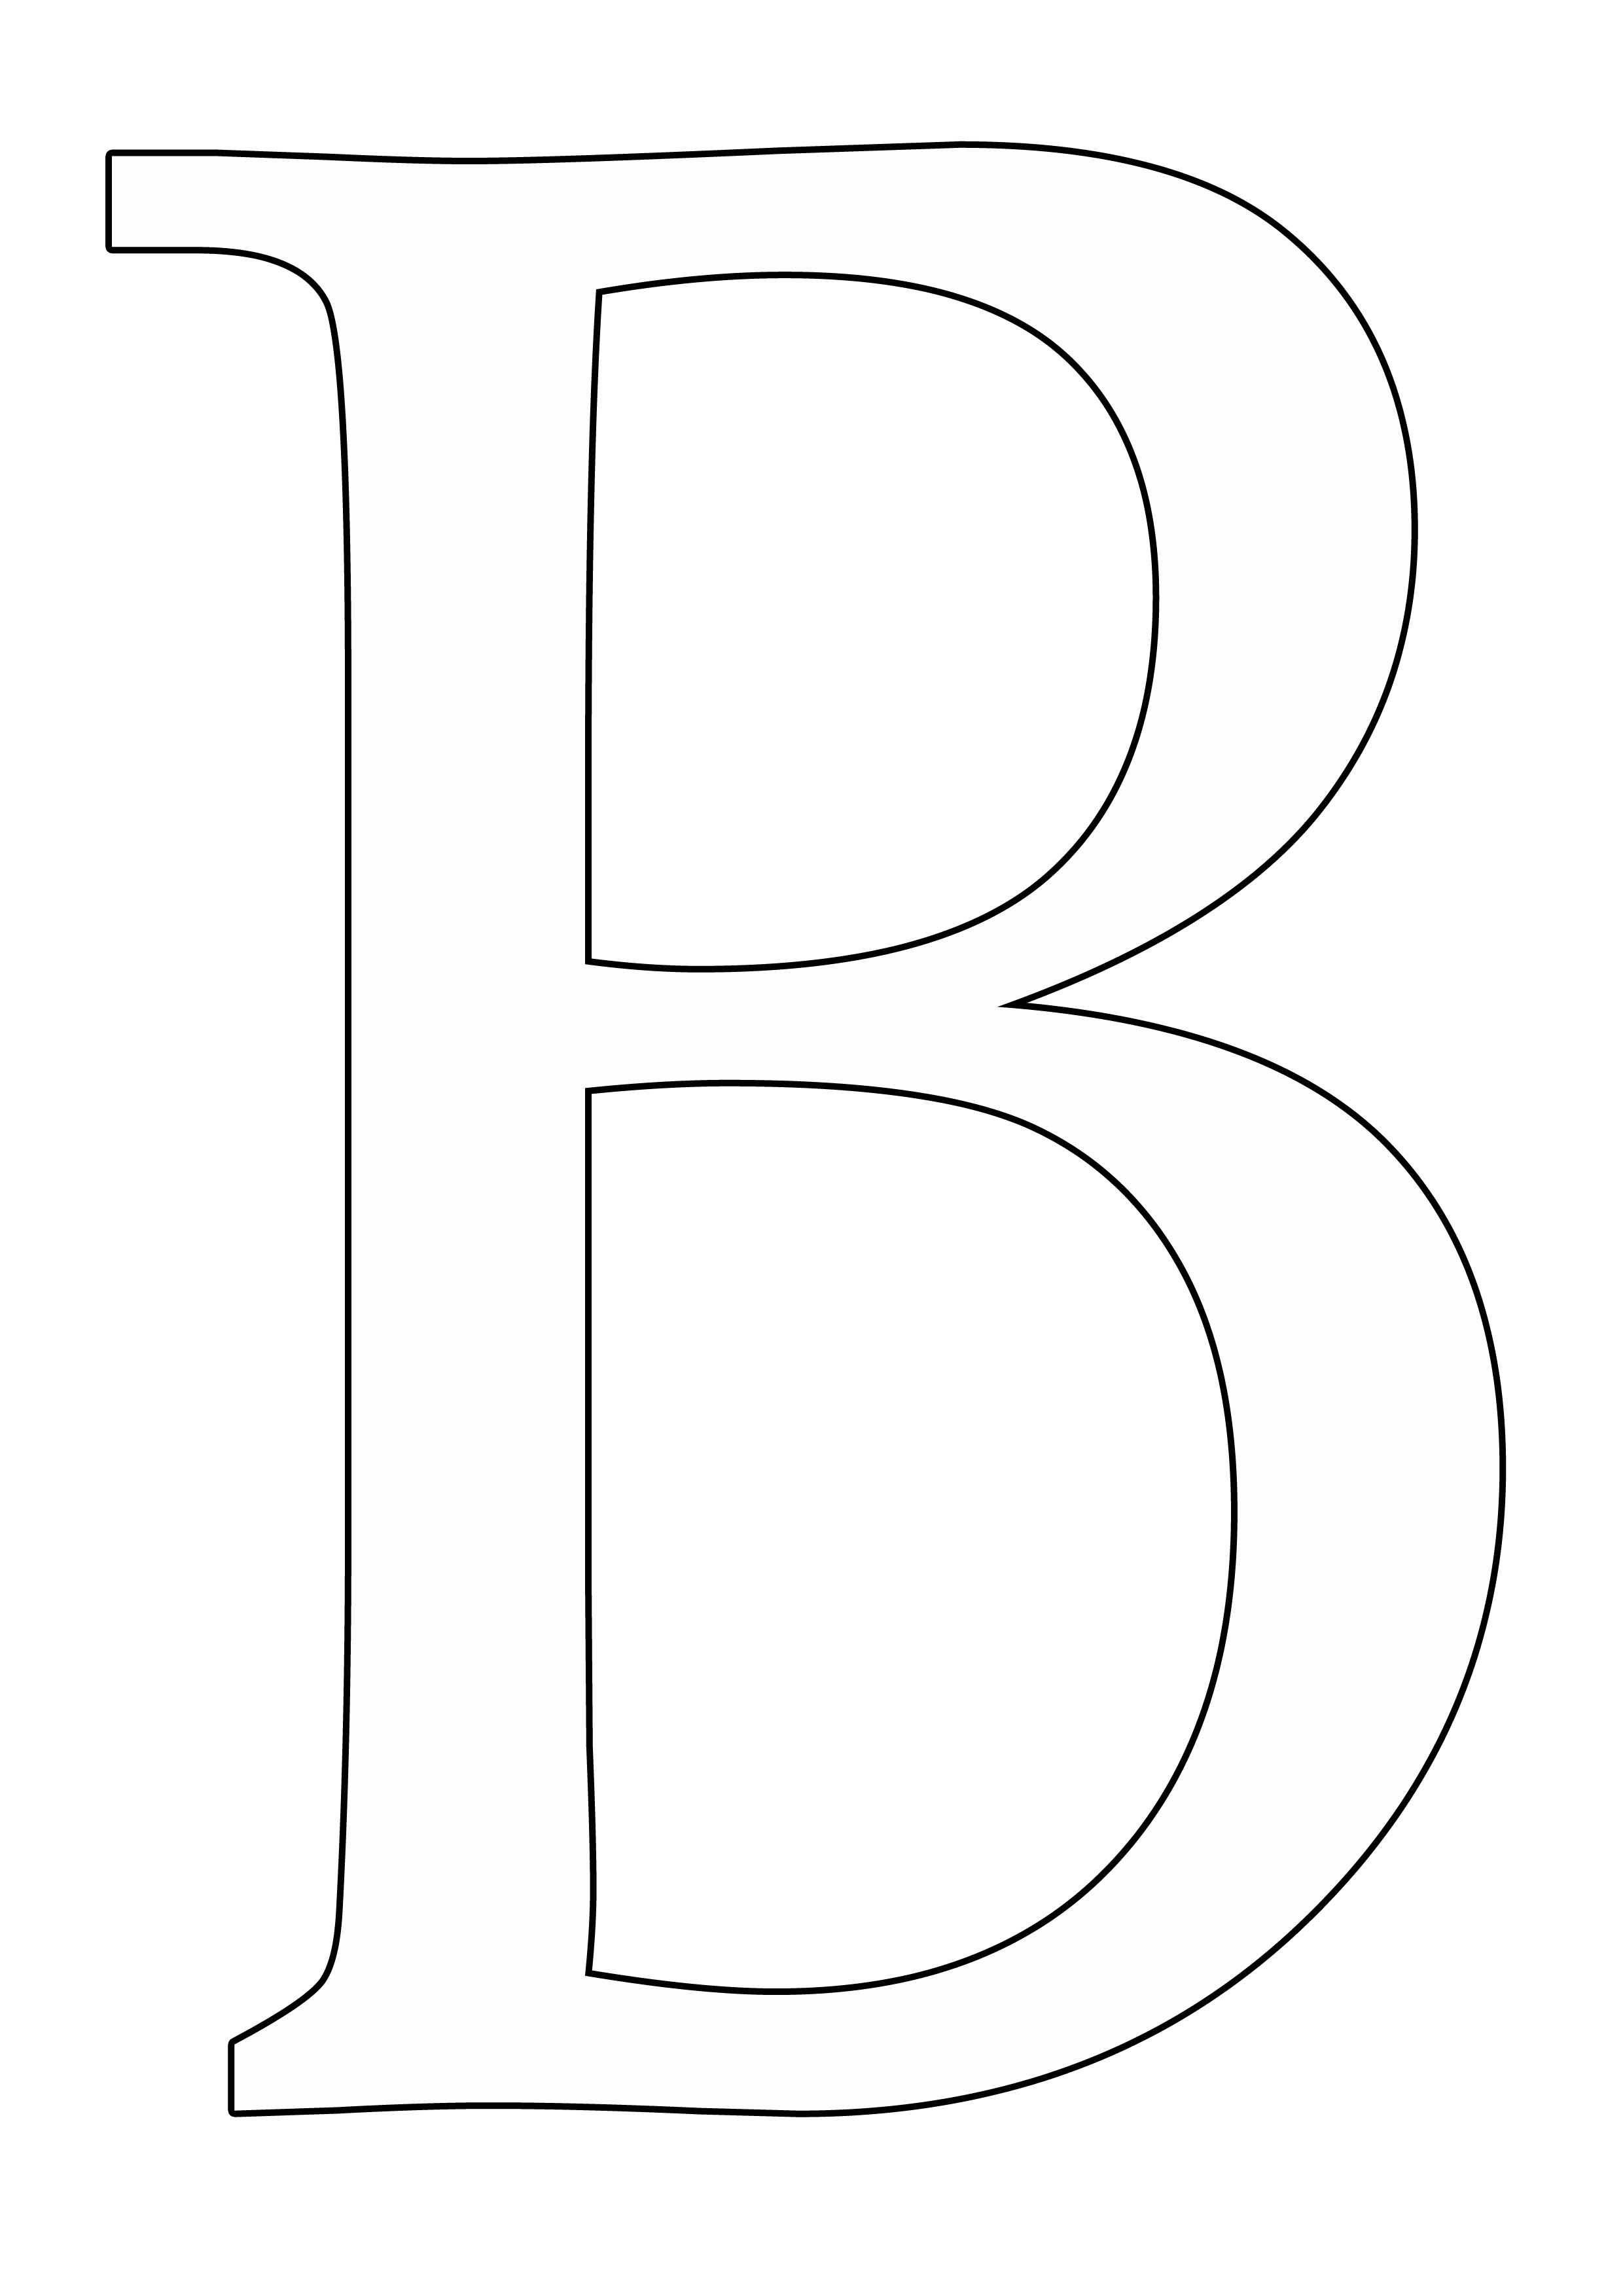 трафареты букв а5 для вырезания из бумаги шаблоны сказать хотел